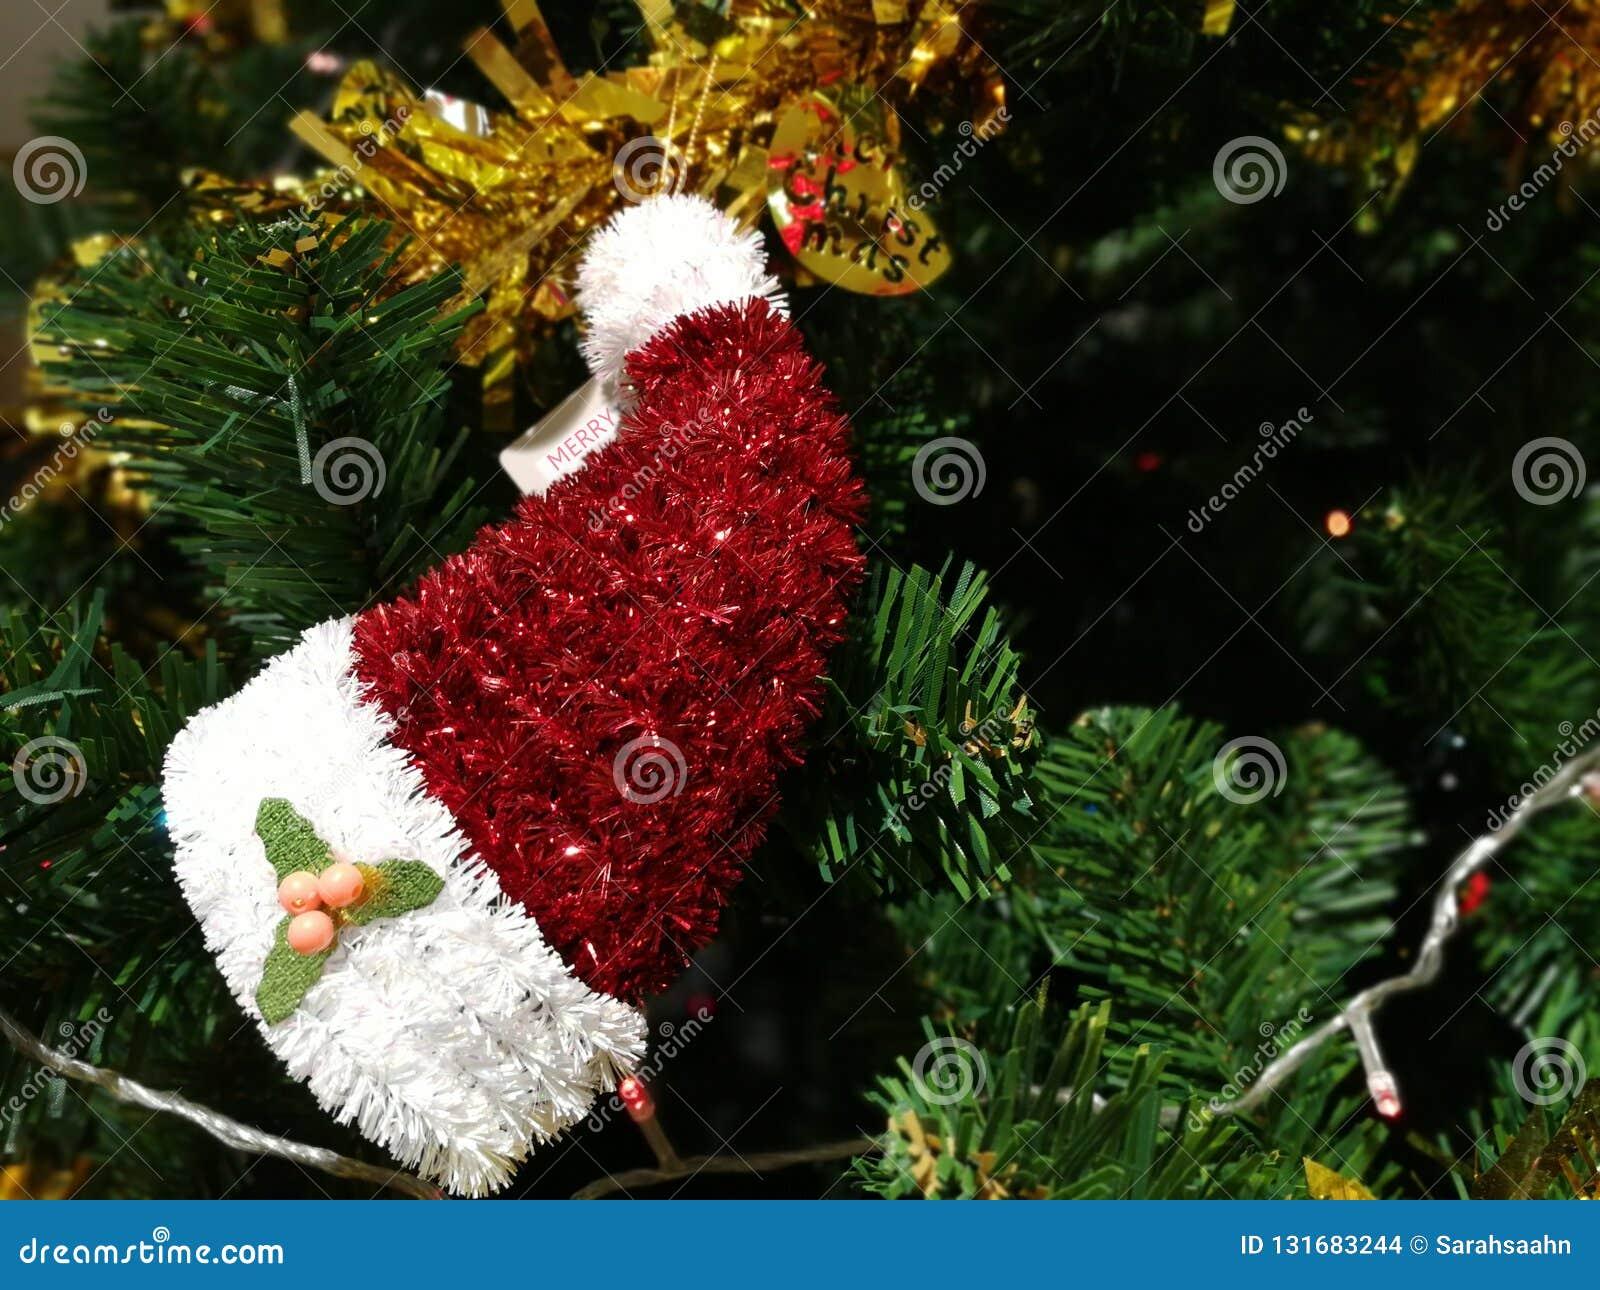 82489237b775e Mini Santa Claus Hat With Christmas Tree Decoration Stock Photo ...